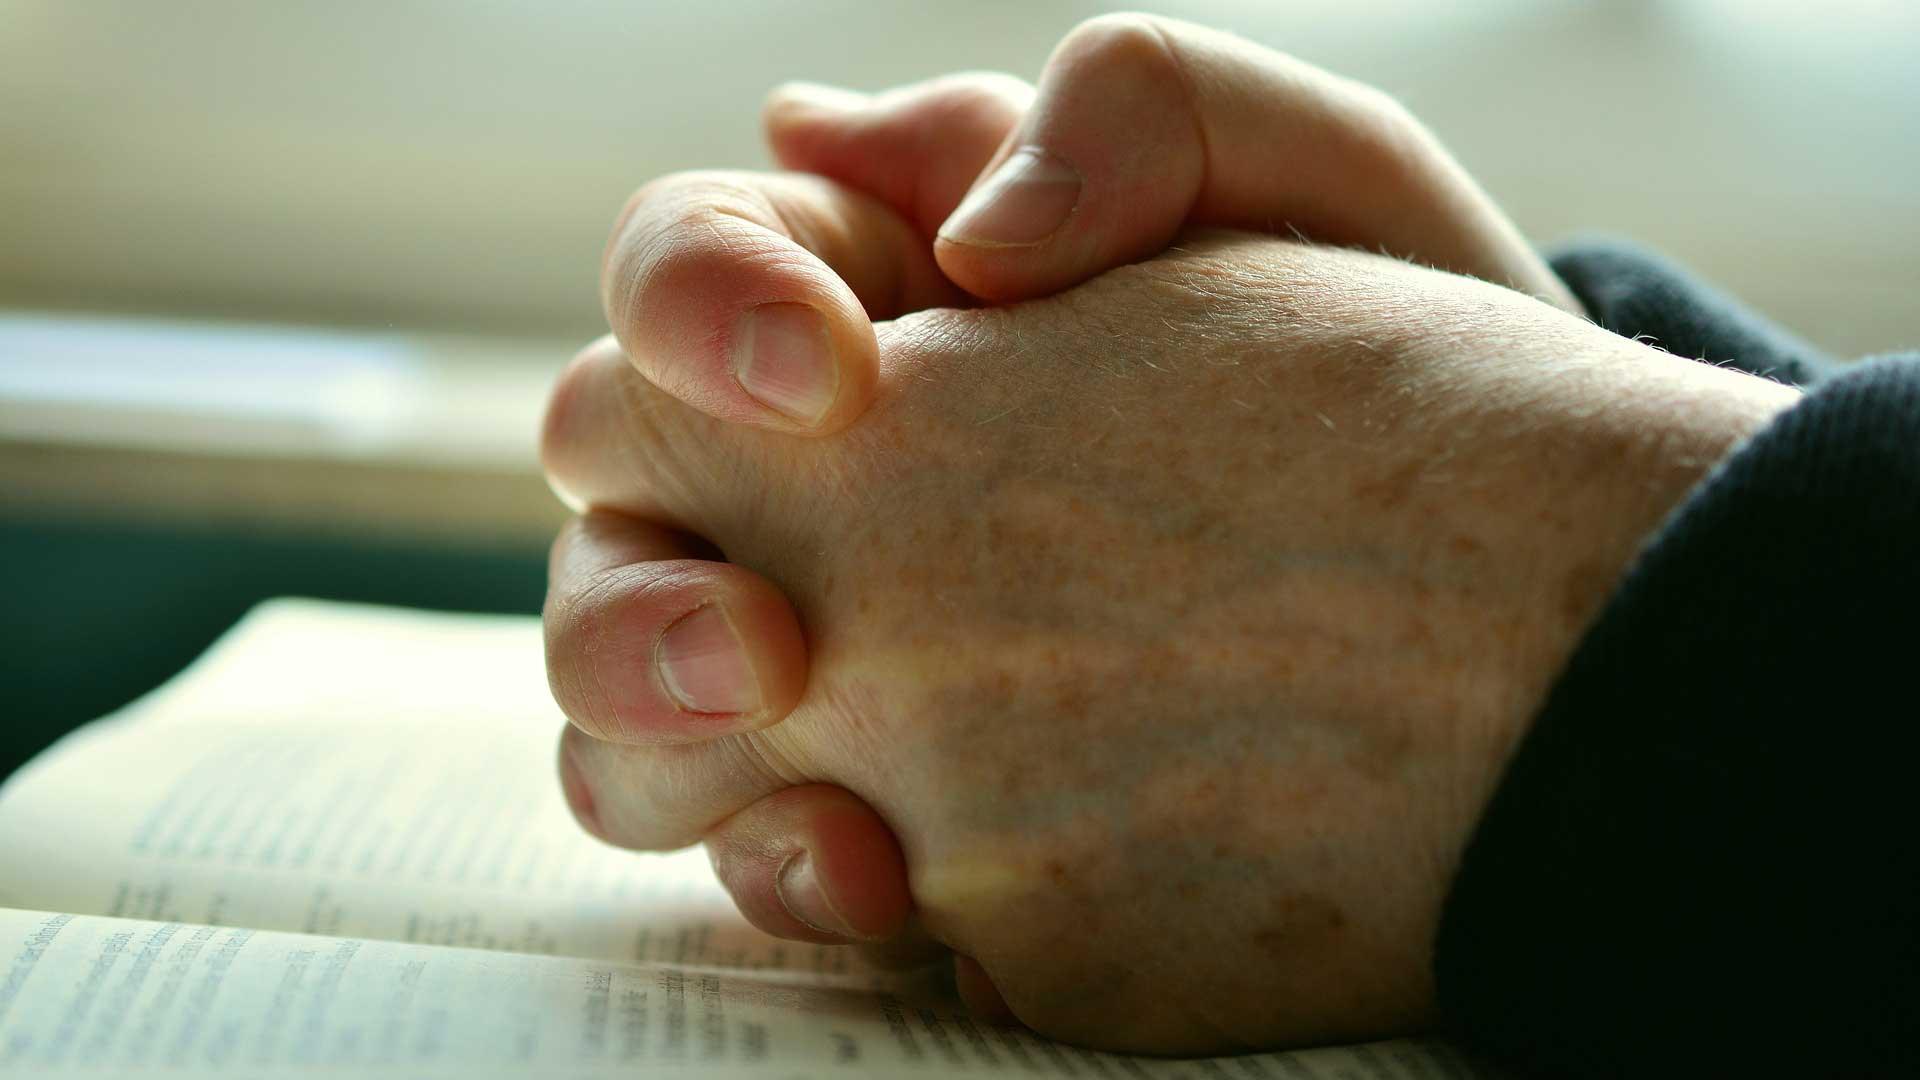 Image of praying person by congerdesign via Pixabay.